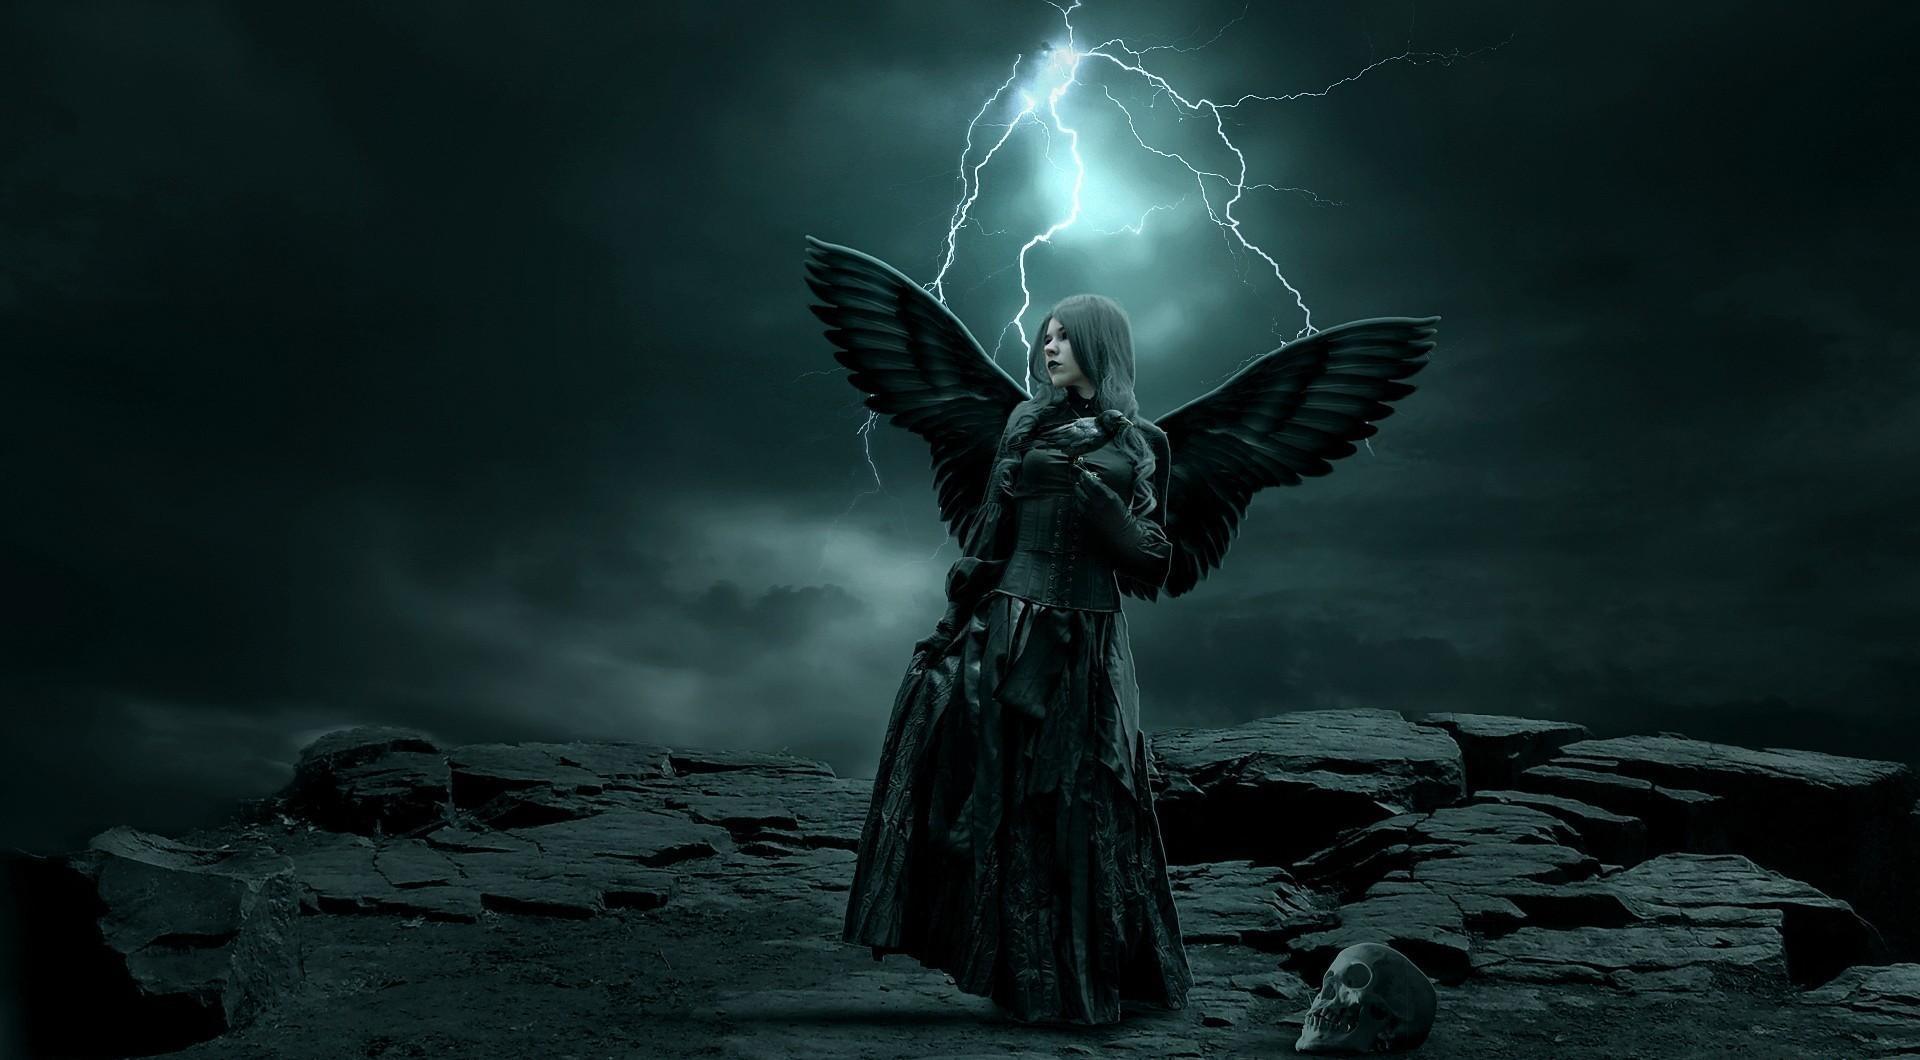 gothic angel women skull cg digital art lightning storm wallpaper 1920x1060